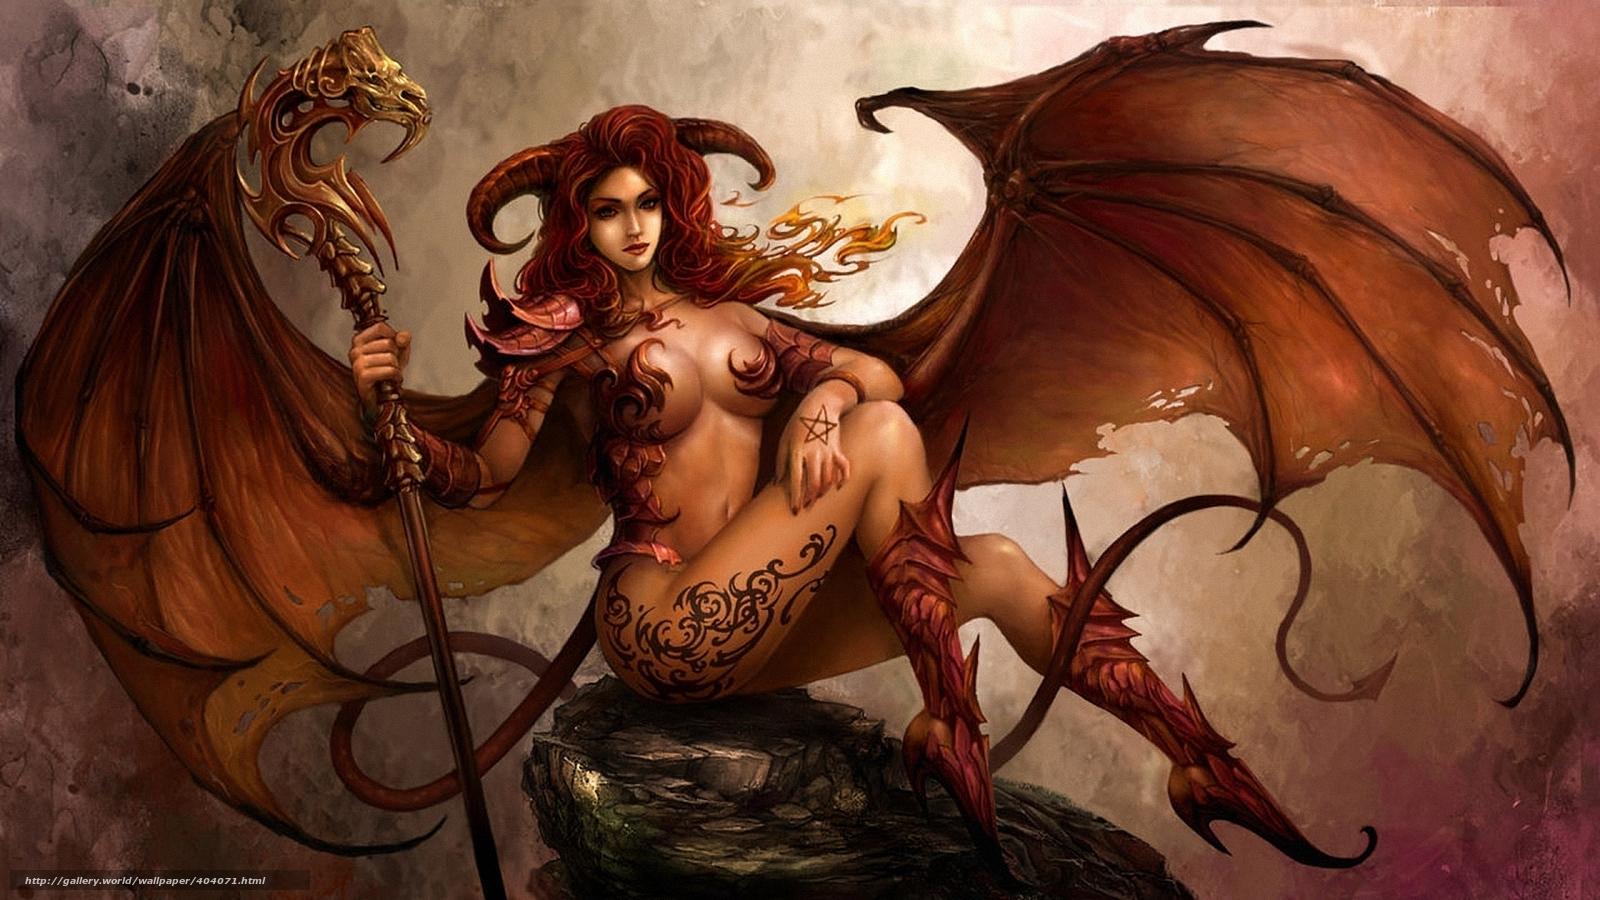 Diablo 3 cartoon sex smut comics